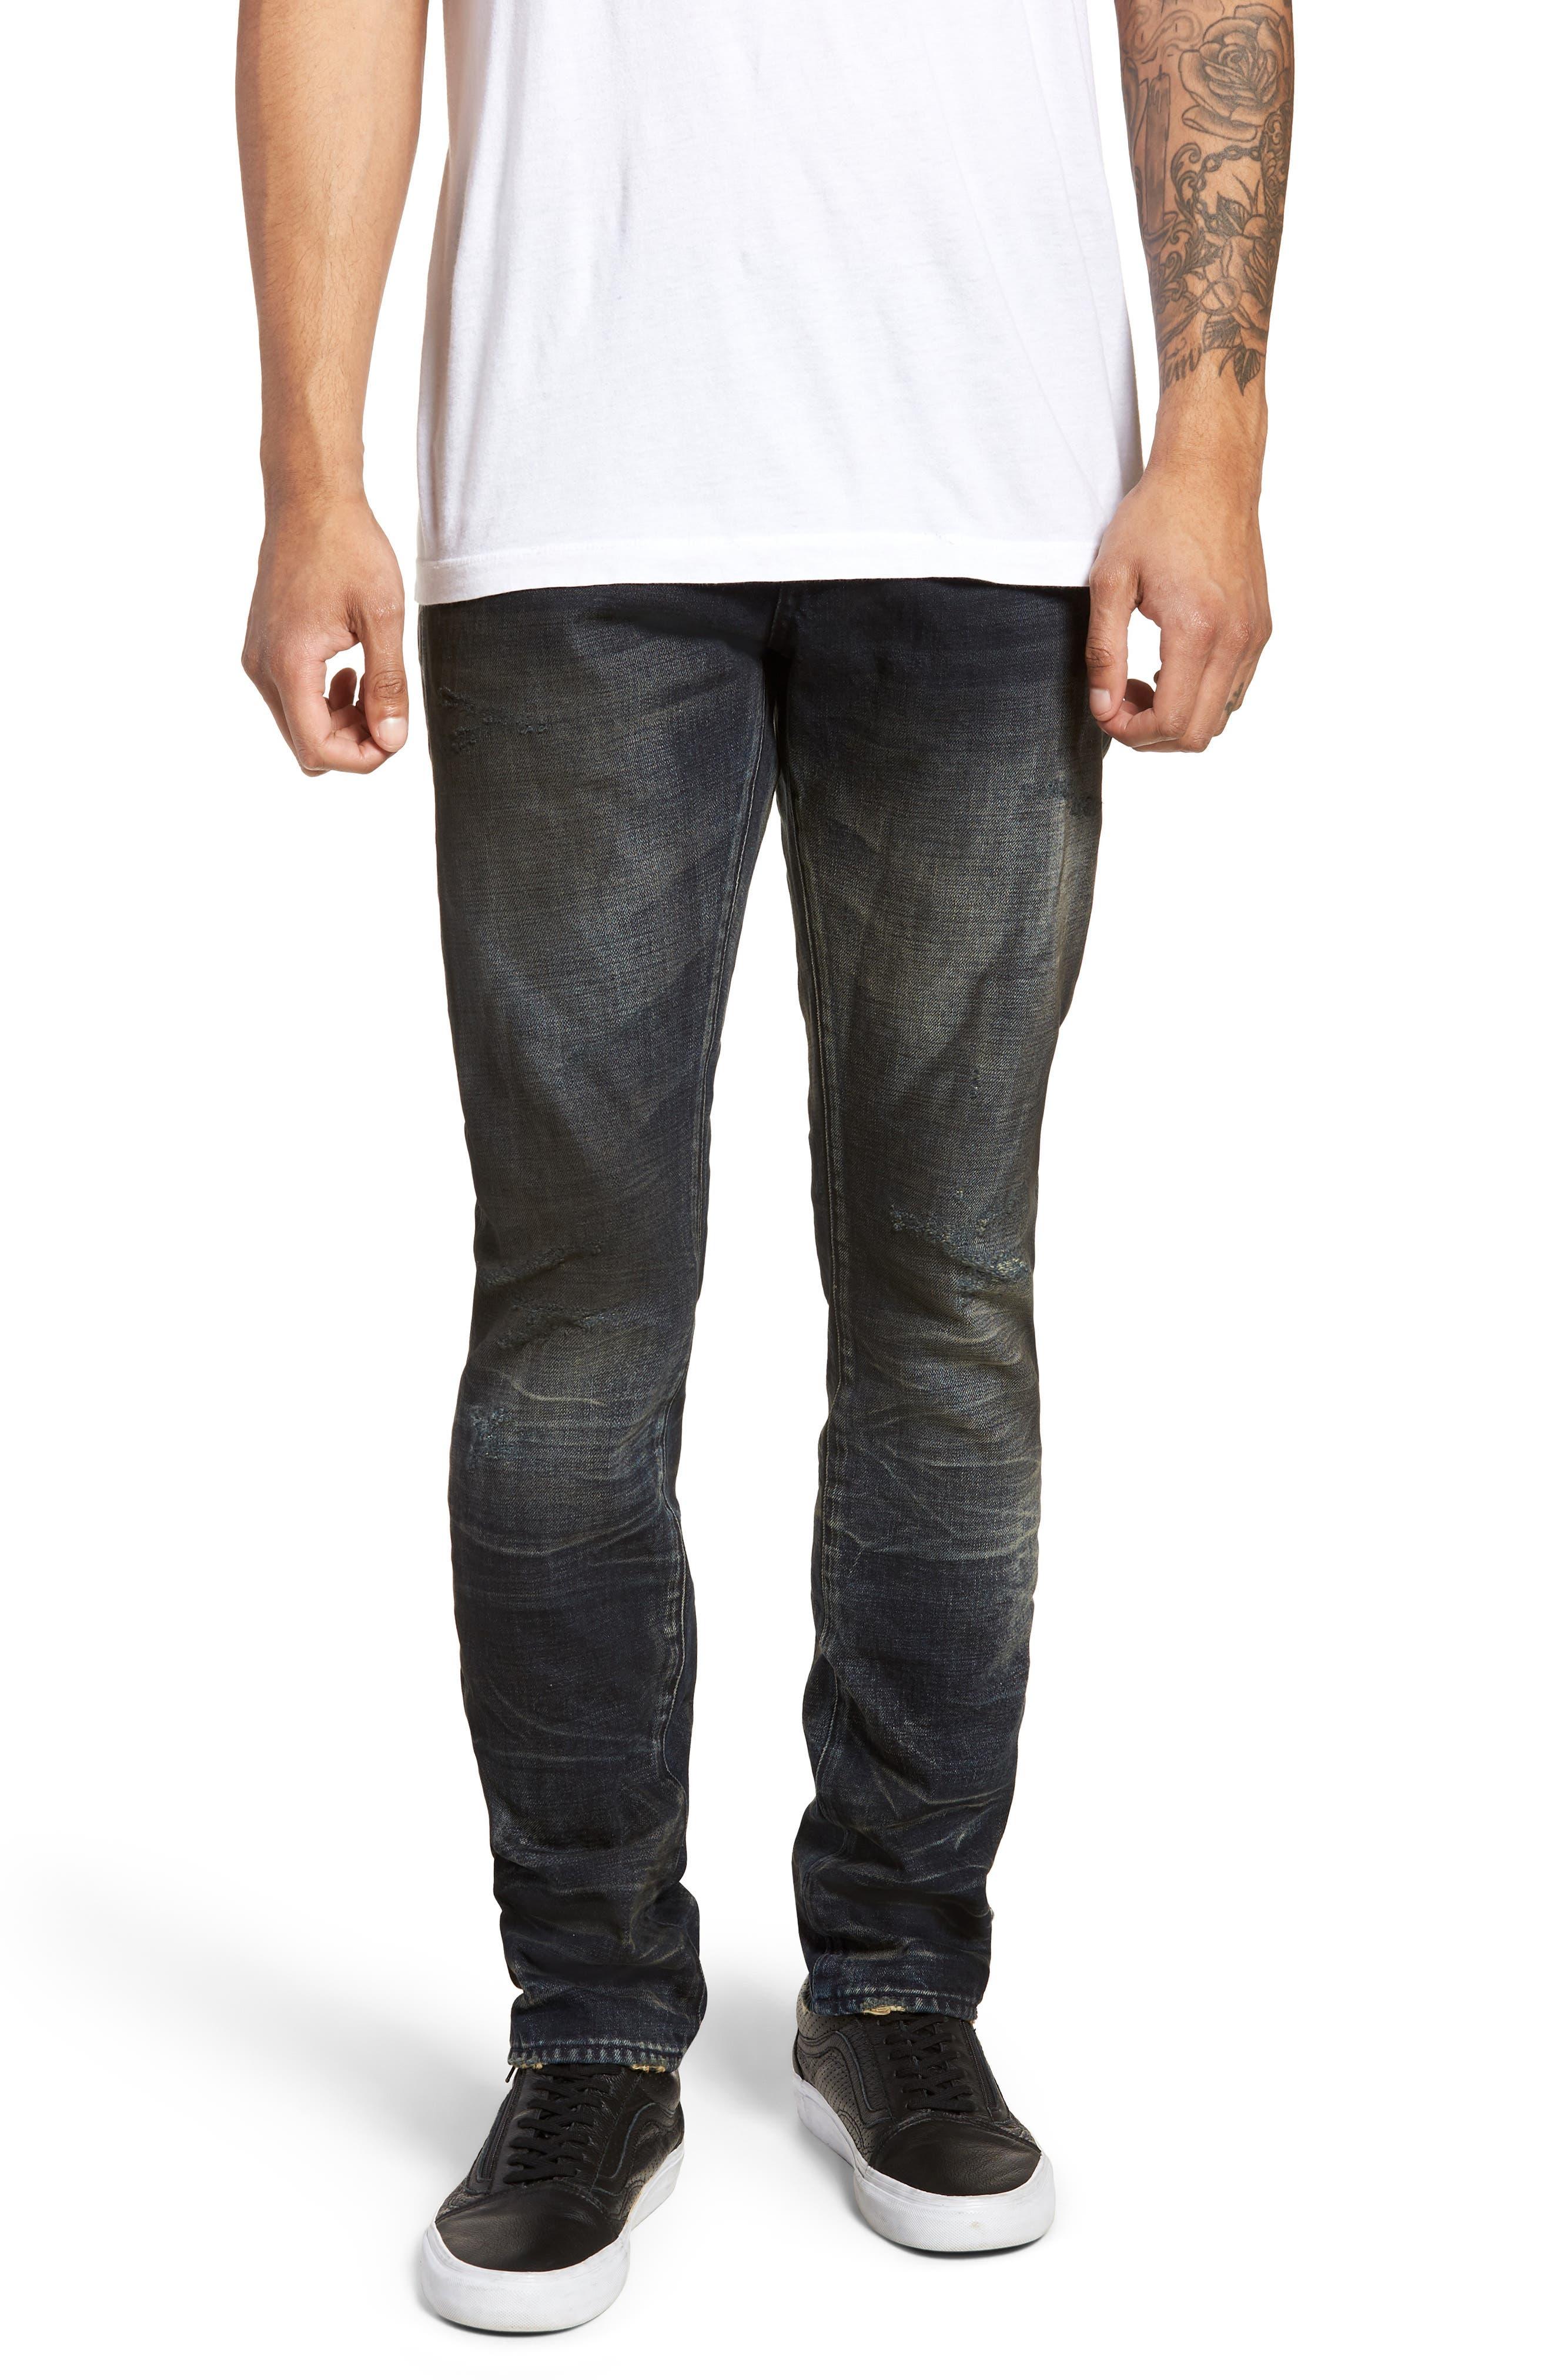 Demon Slim Straight Fit Jeans,                         Main,                         color, Linger